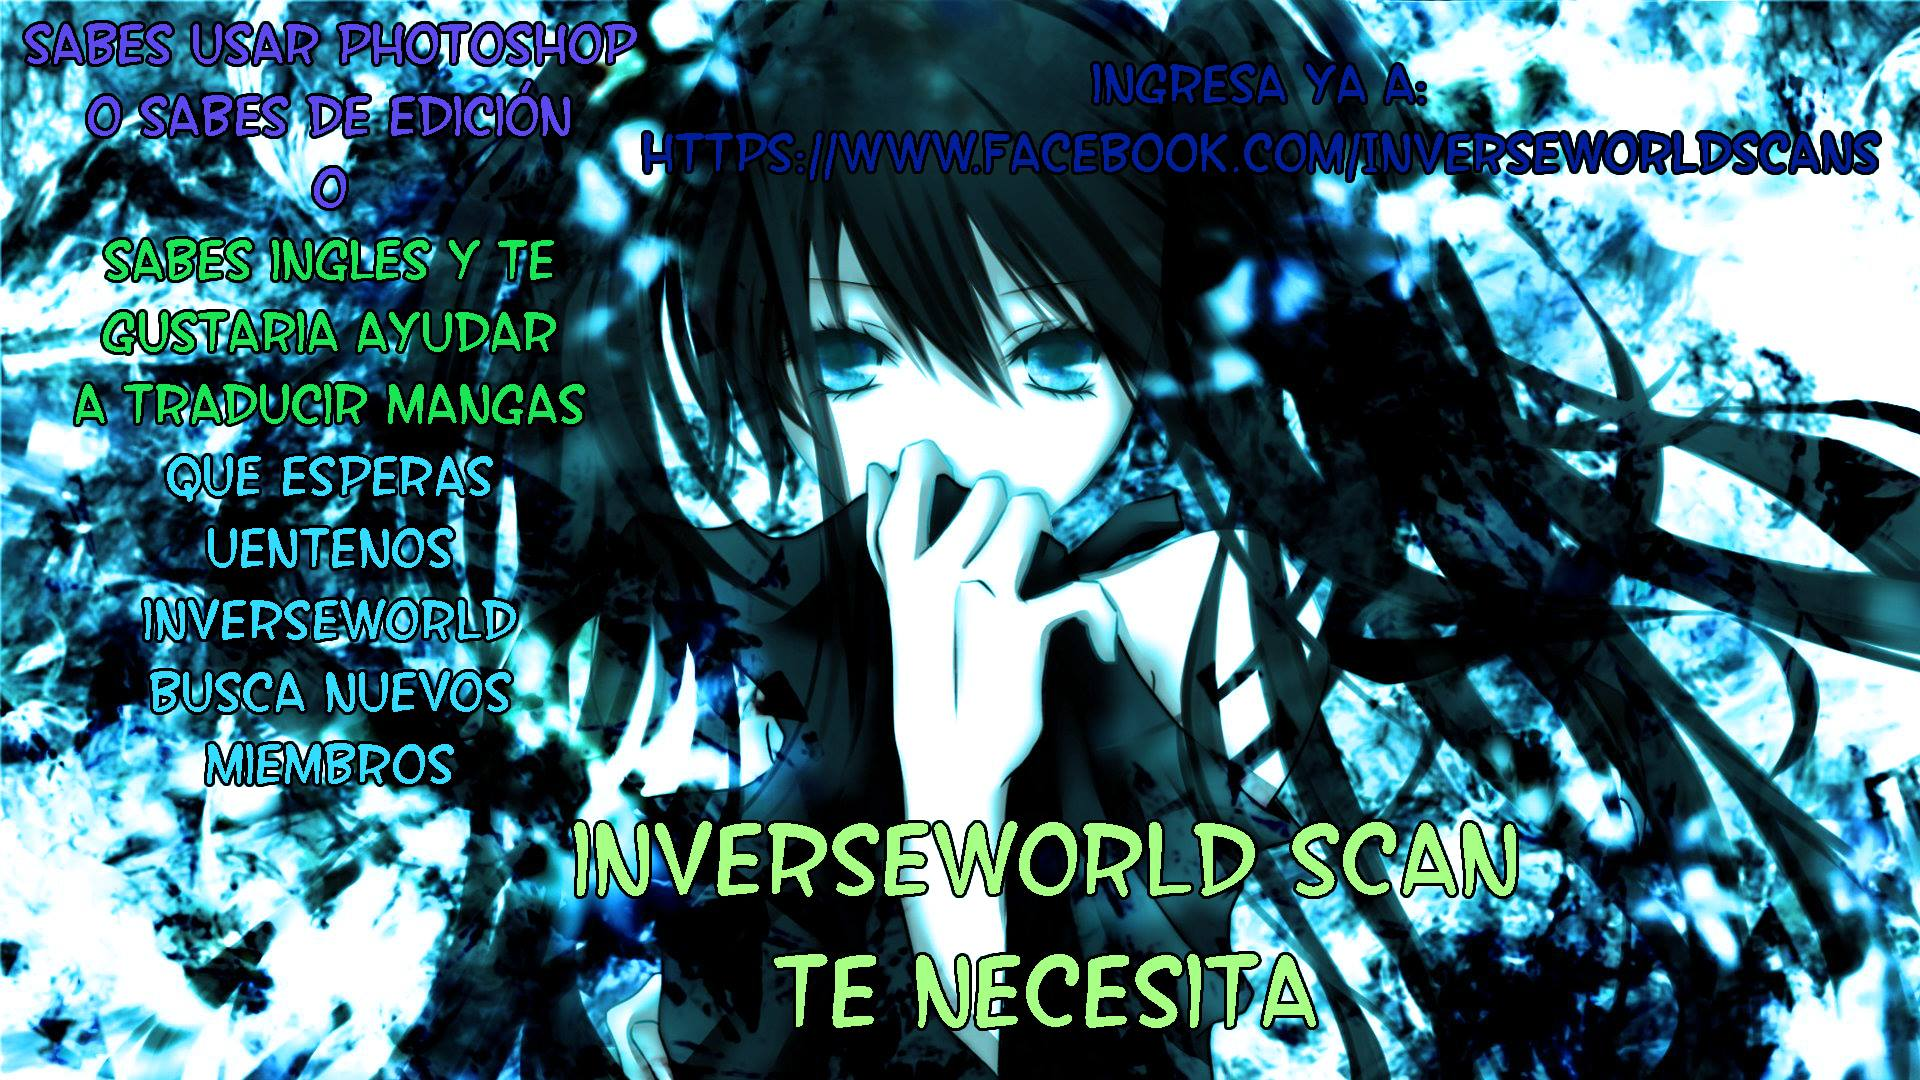 https://c5.ninemanga.com/es_manga/18/16210/415315/bd5af7cd922fd2603be4ee3dc43b0b77.jpg Page 2